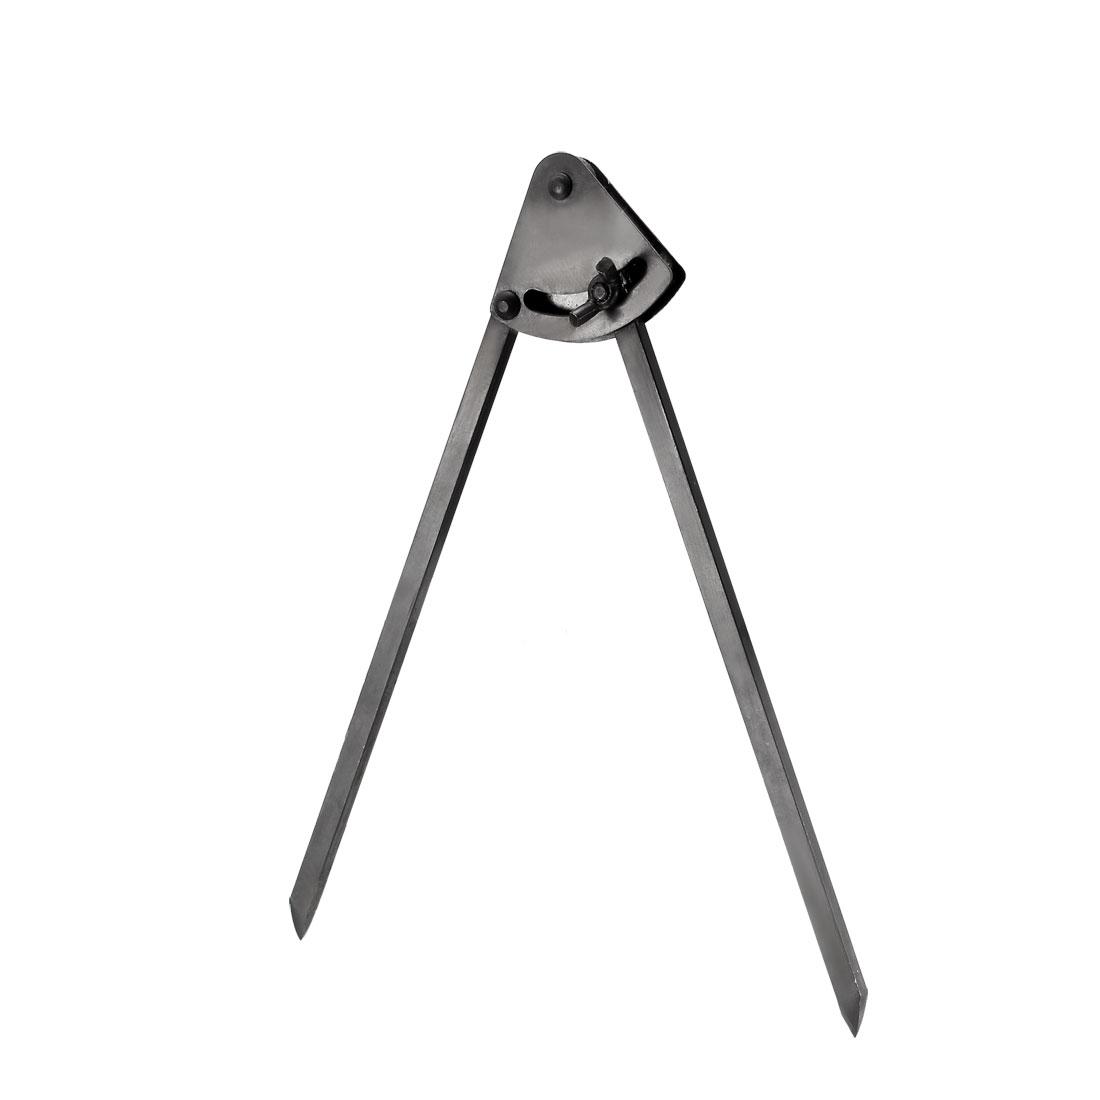 Positioning Divider Compass 250mm 10 Inch Spring Industrial Marking Gauge